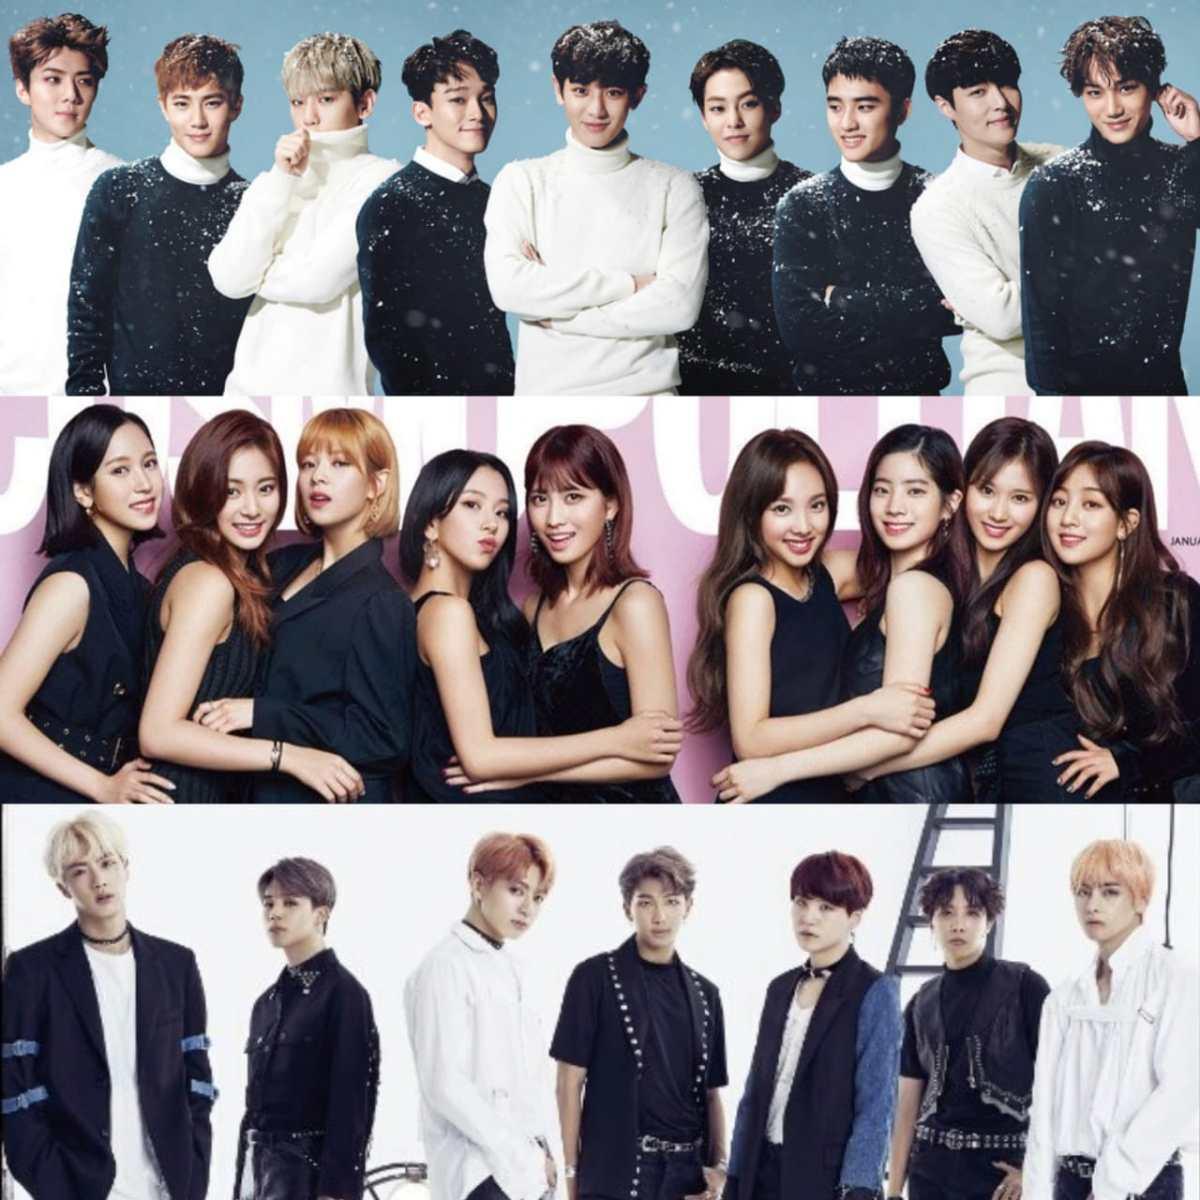 EXO، TWICE وBTS سيشاركون في حفل SBS غايو ديجون 2018